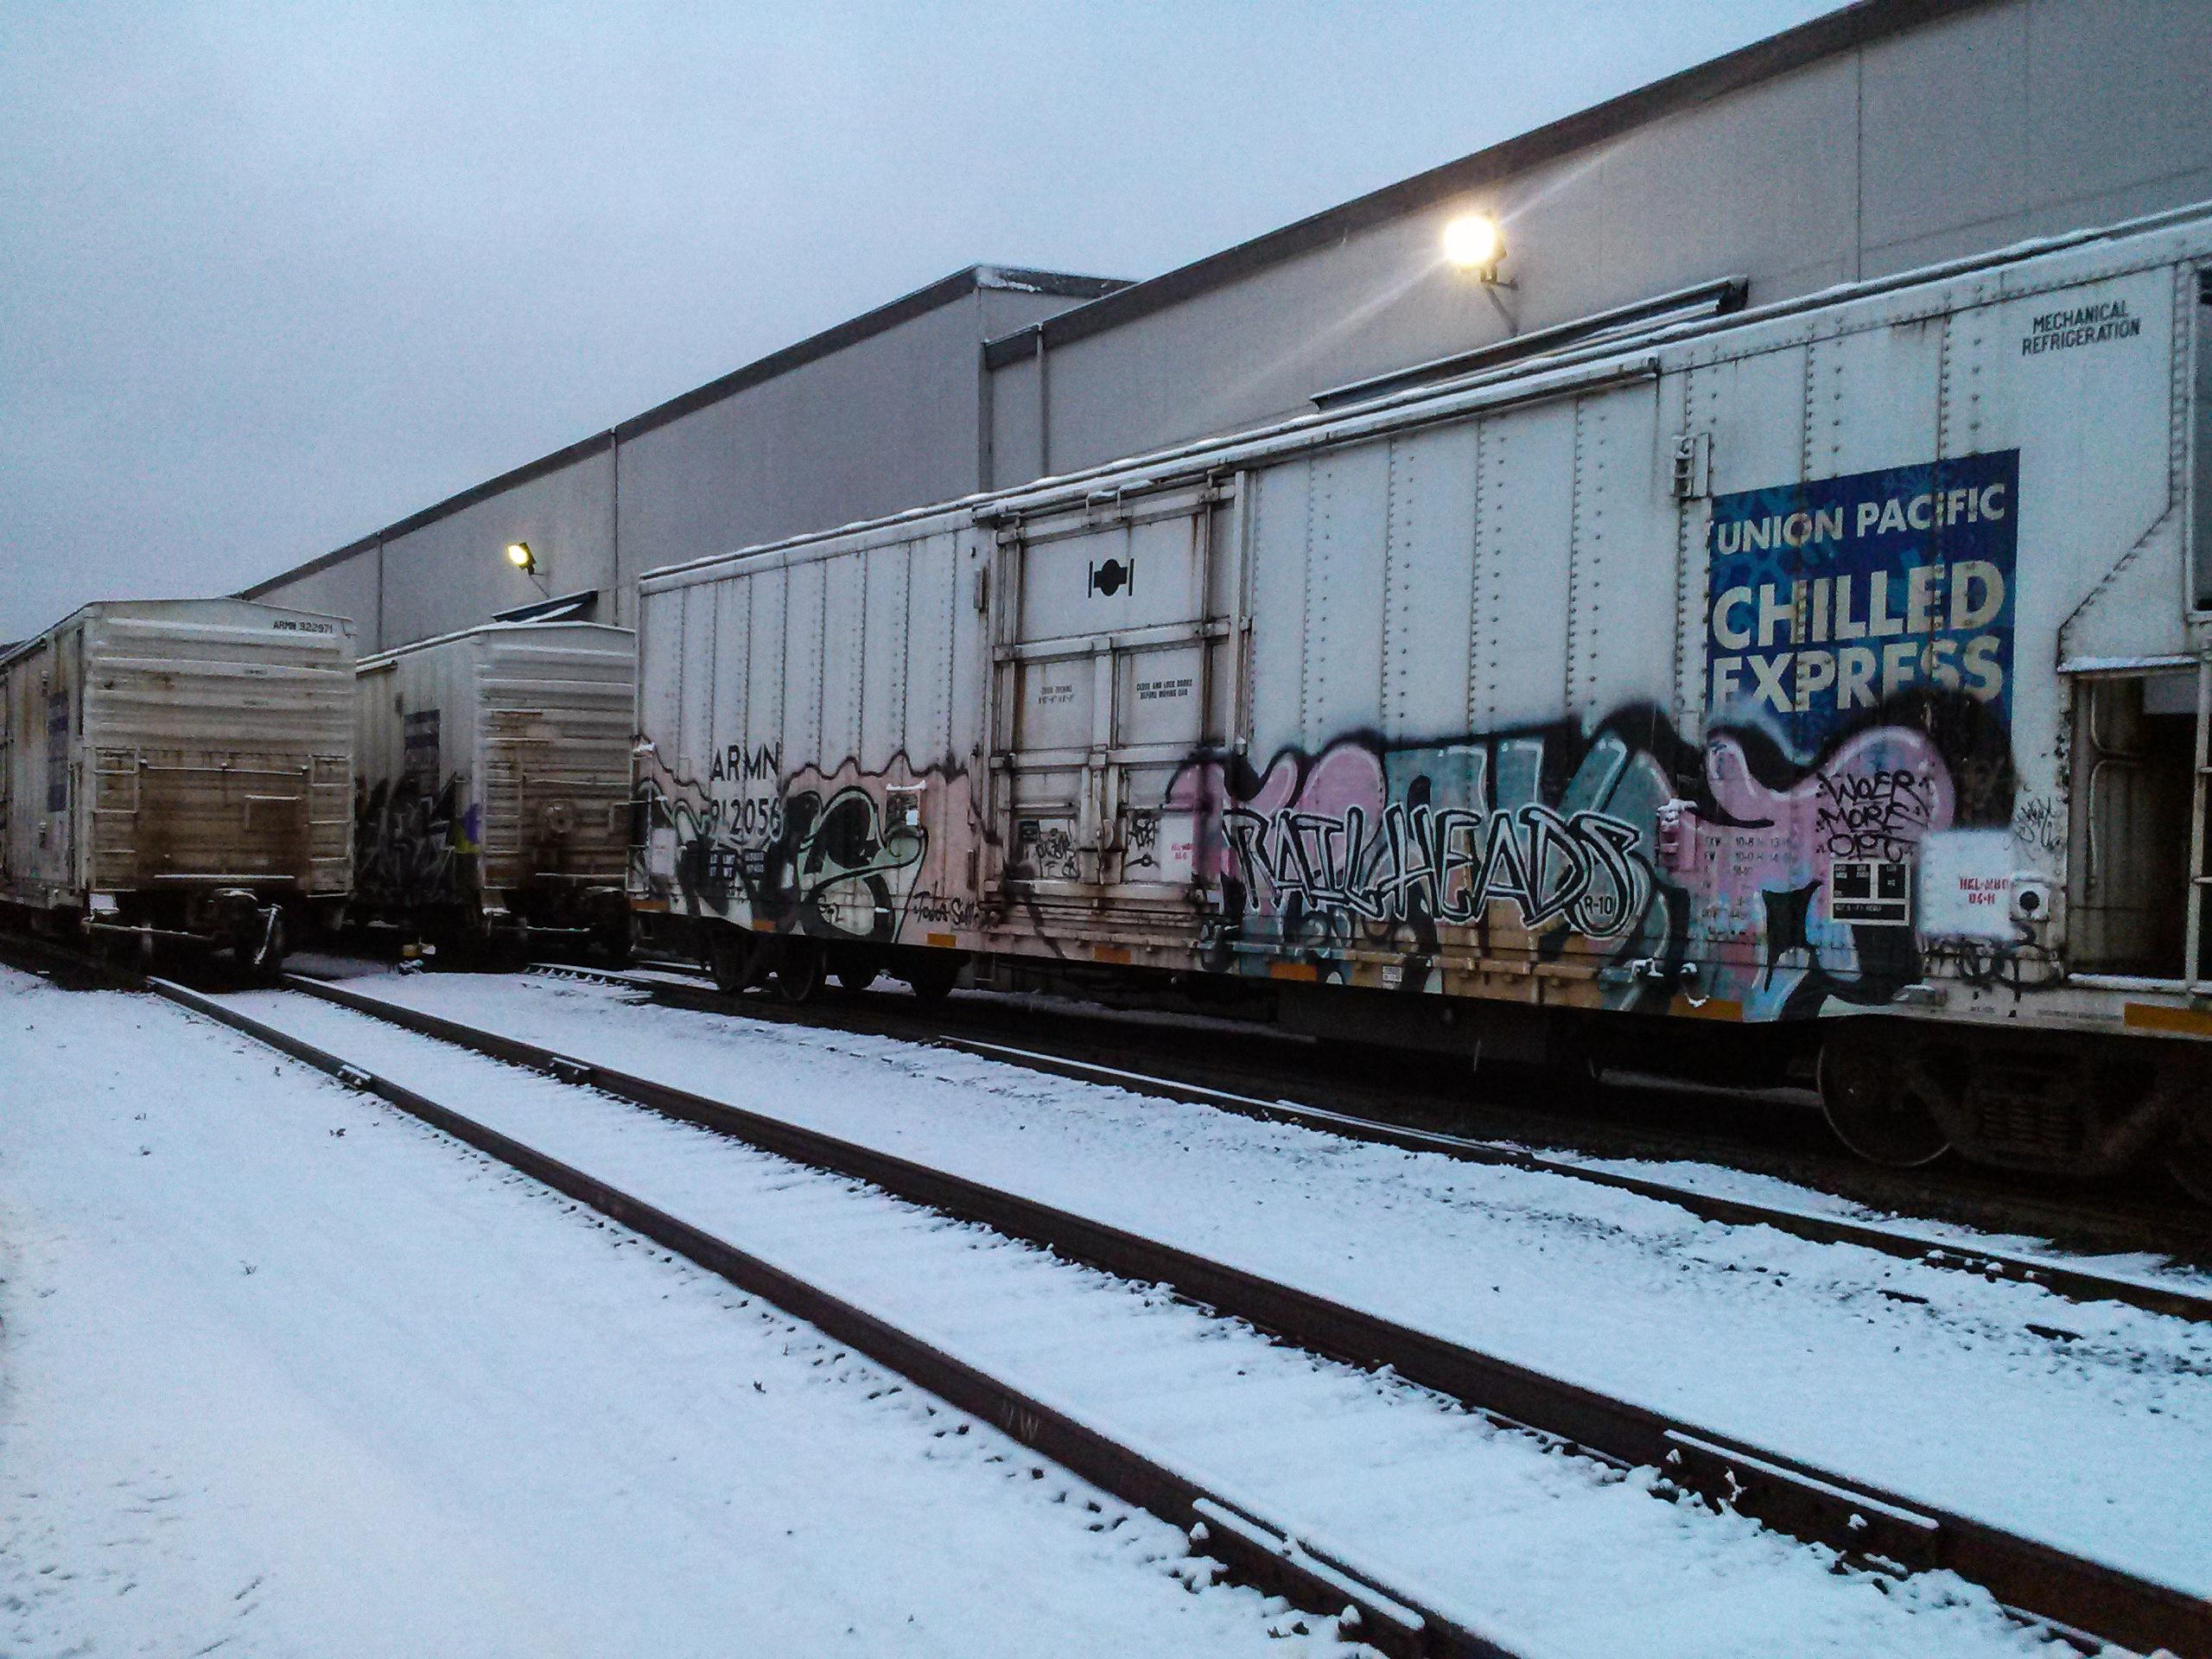 Photo Dec 20, 8 10 07 AM